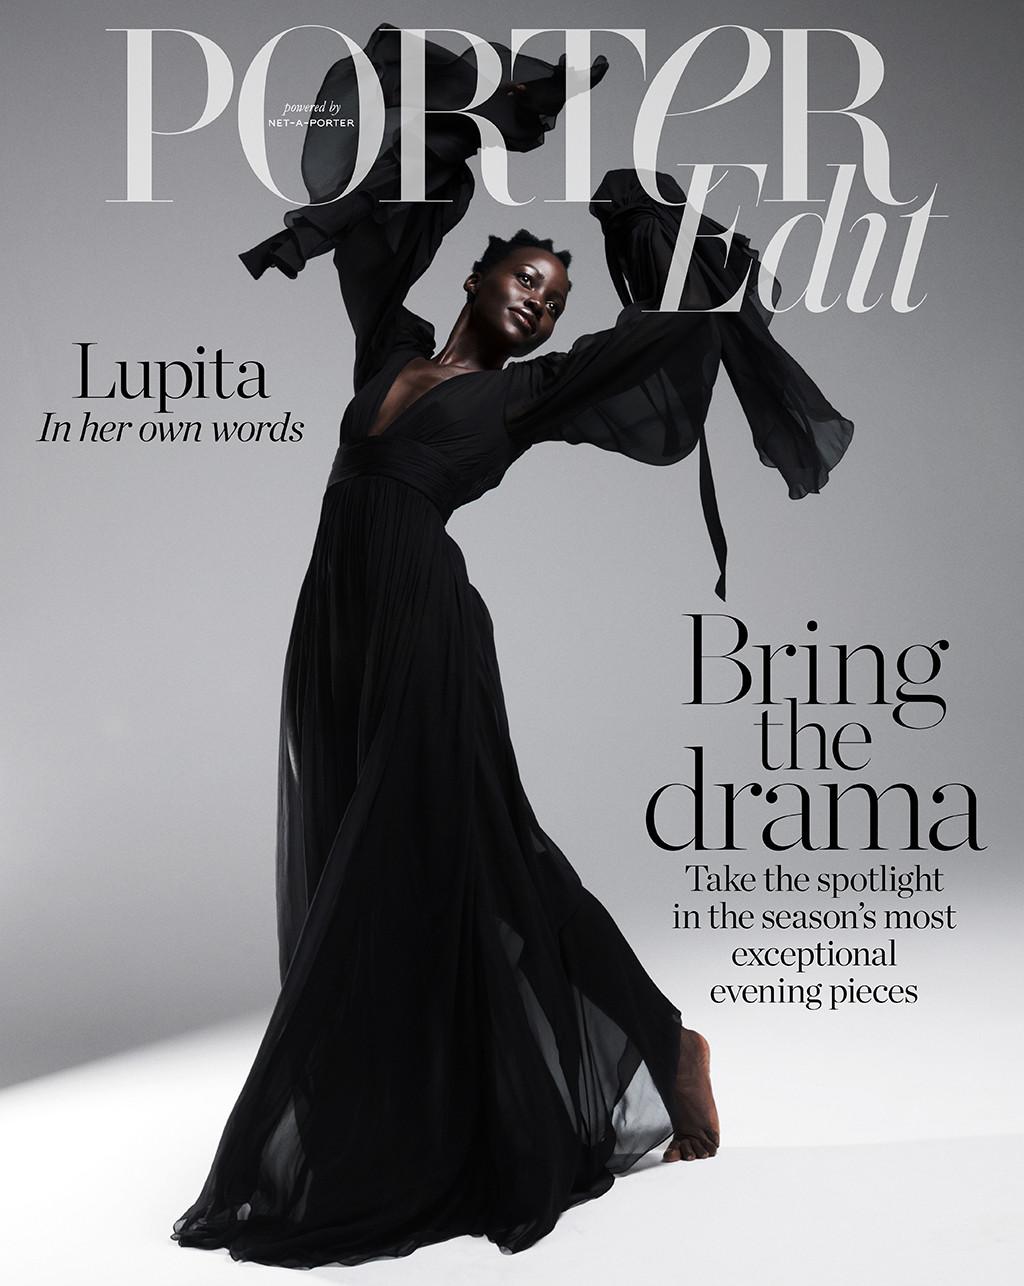 Lupita Nyongo, NET PORTER